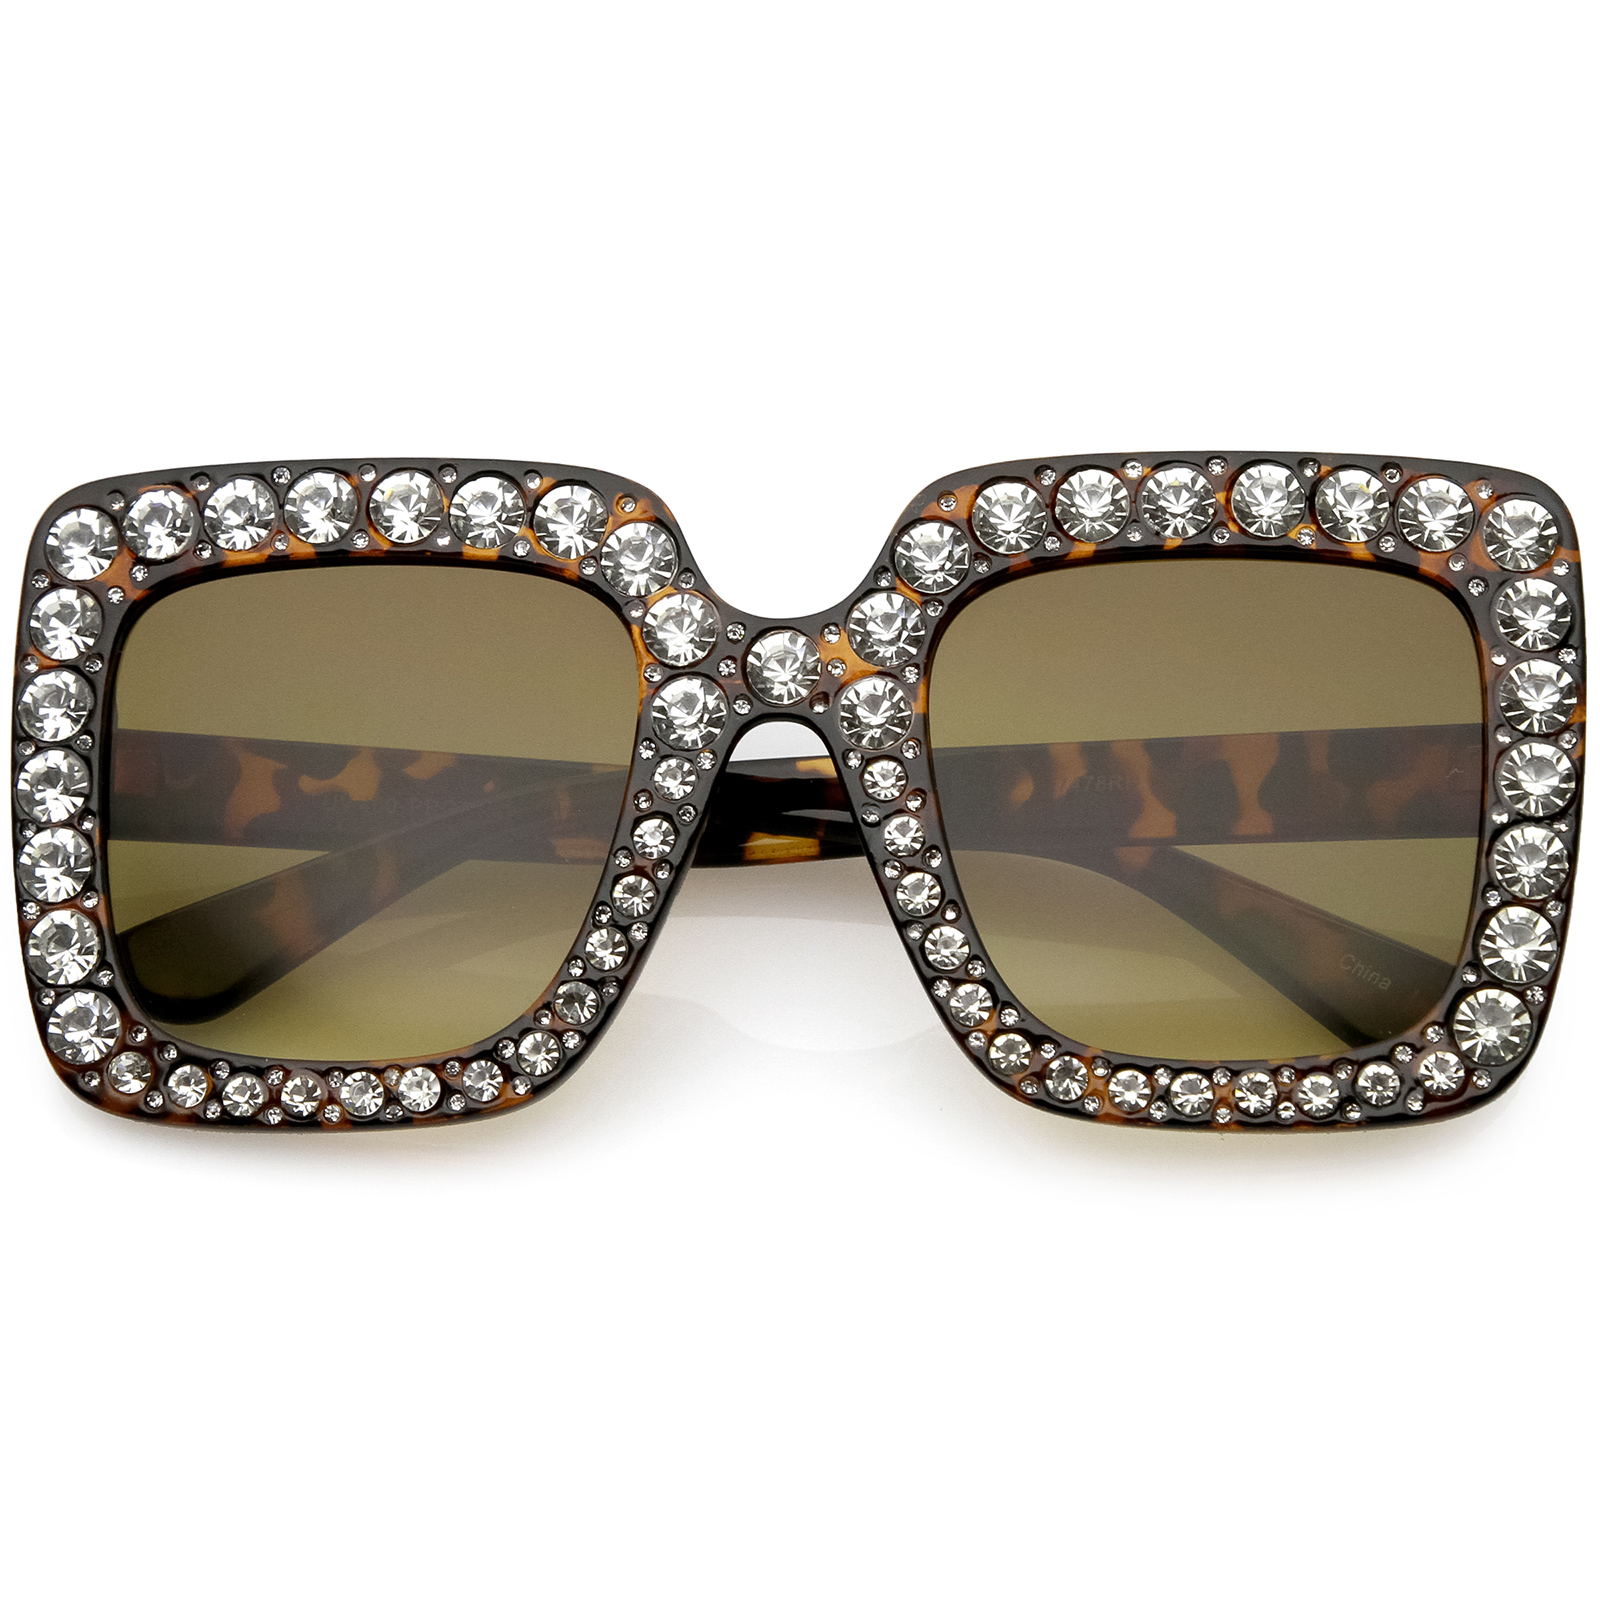 sunglassLA - Designer Oversize Square Sunglasses Crystal Rhinestone Gradient Lens 52mm - 52mm